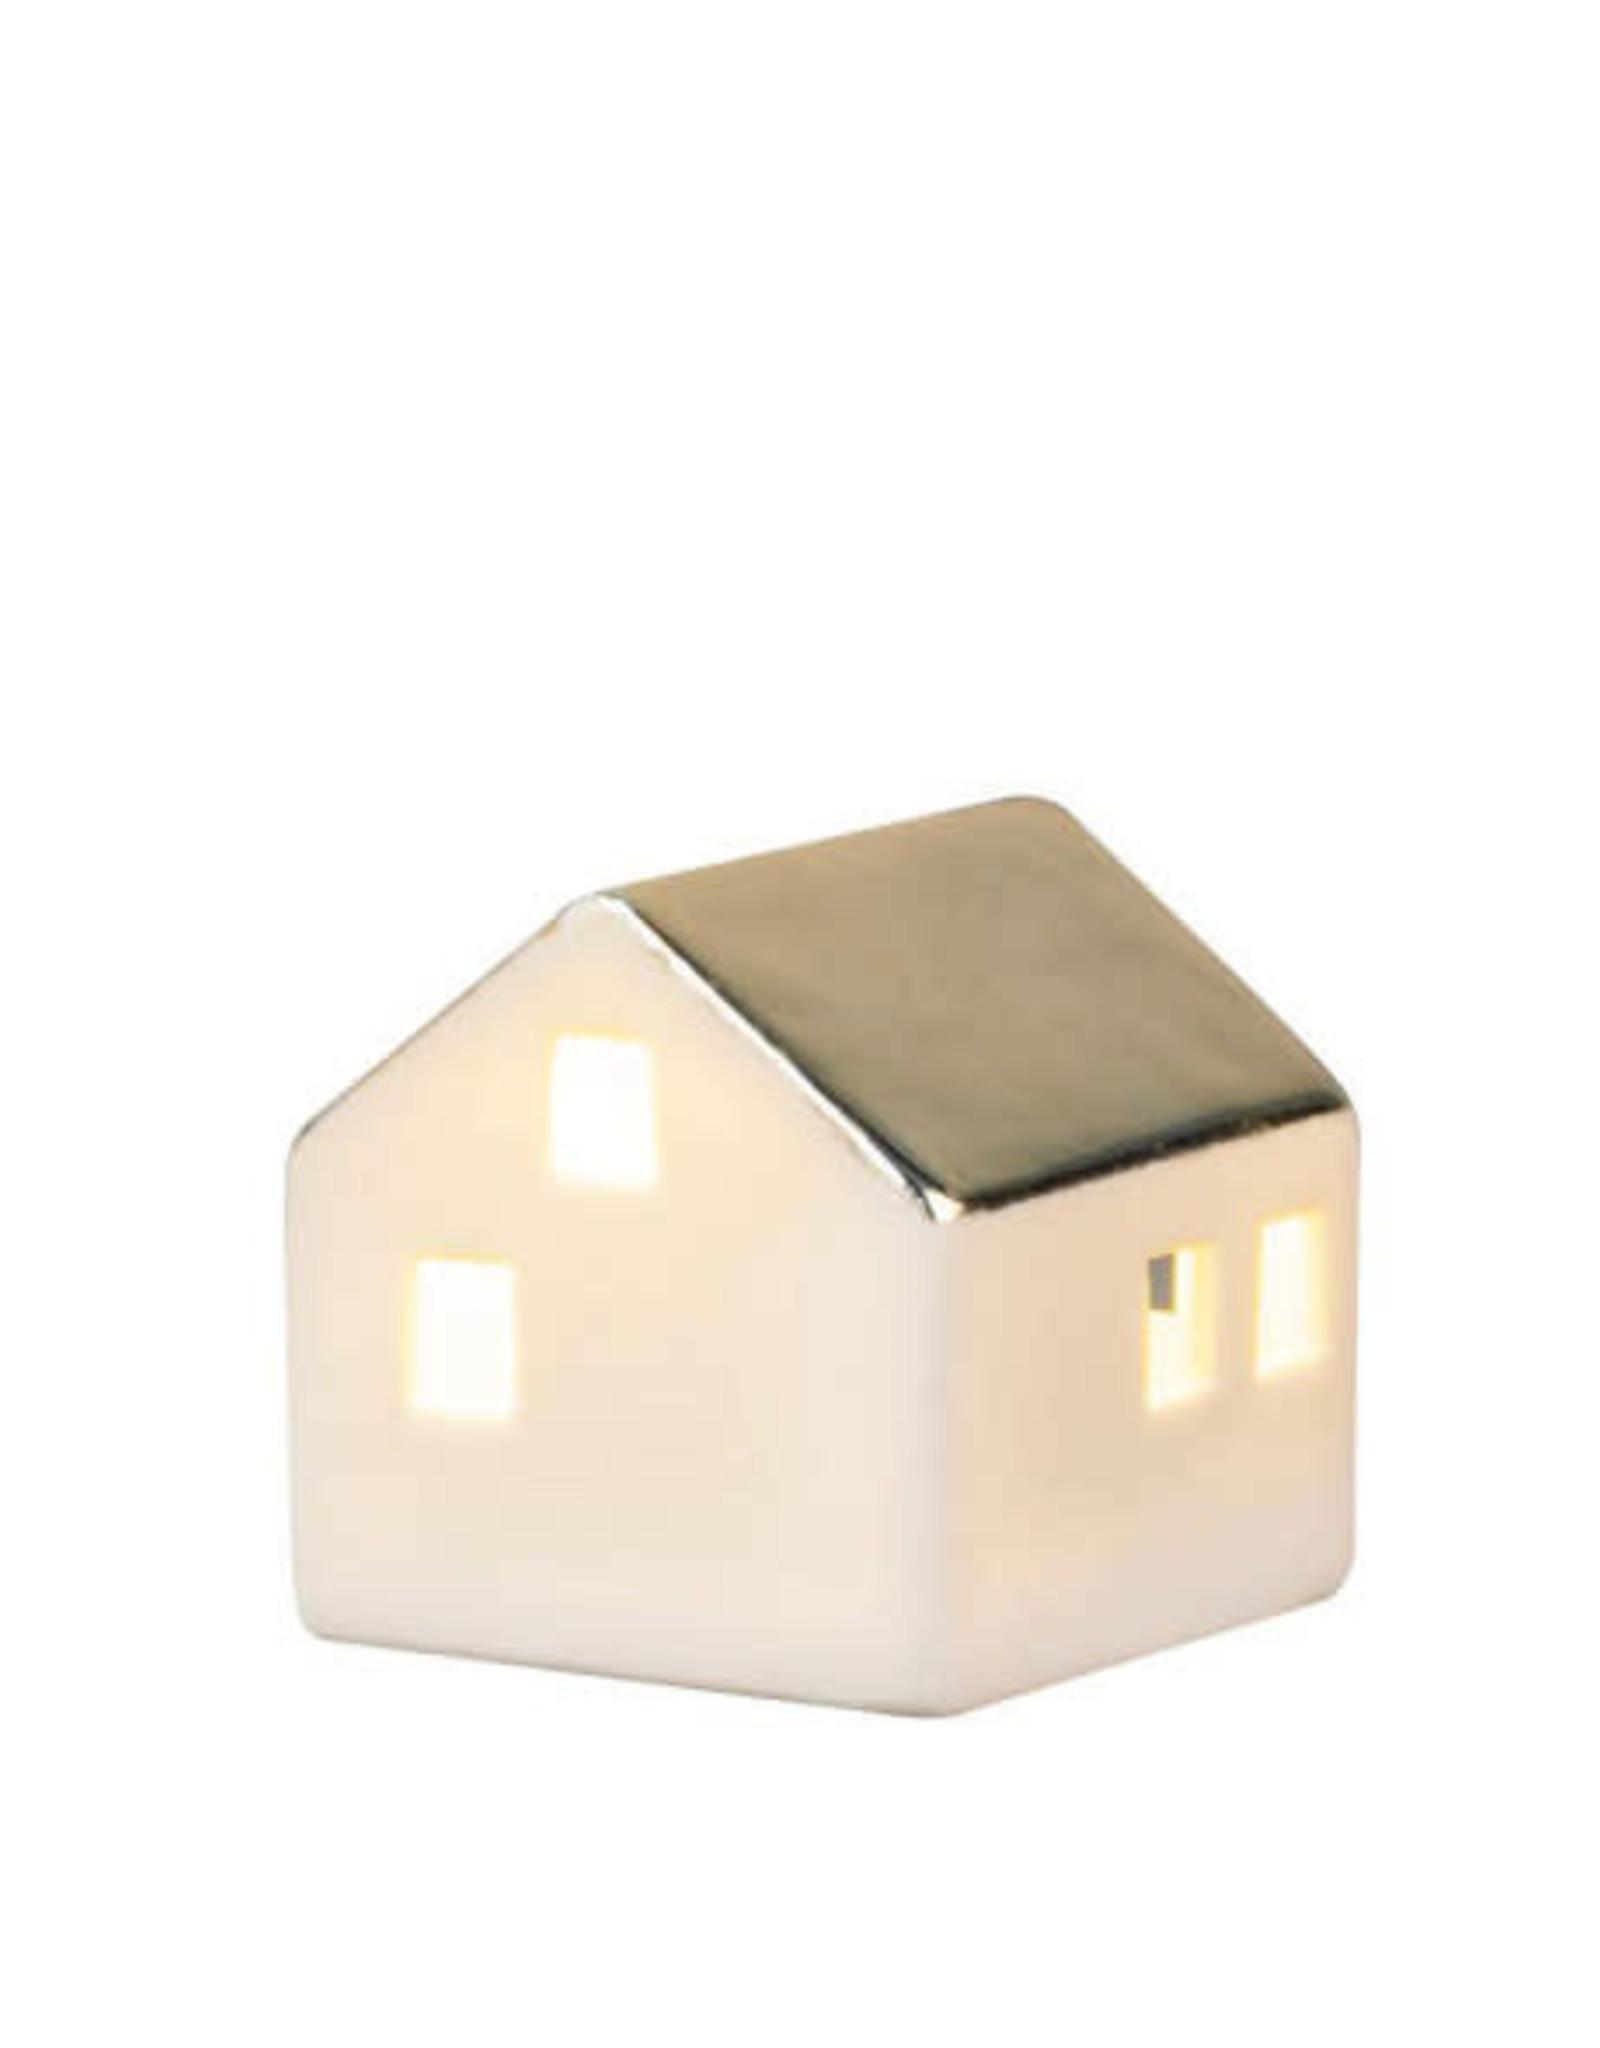 Rader Mini Light House Small 4.5cm